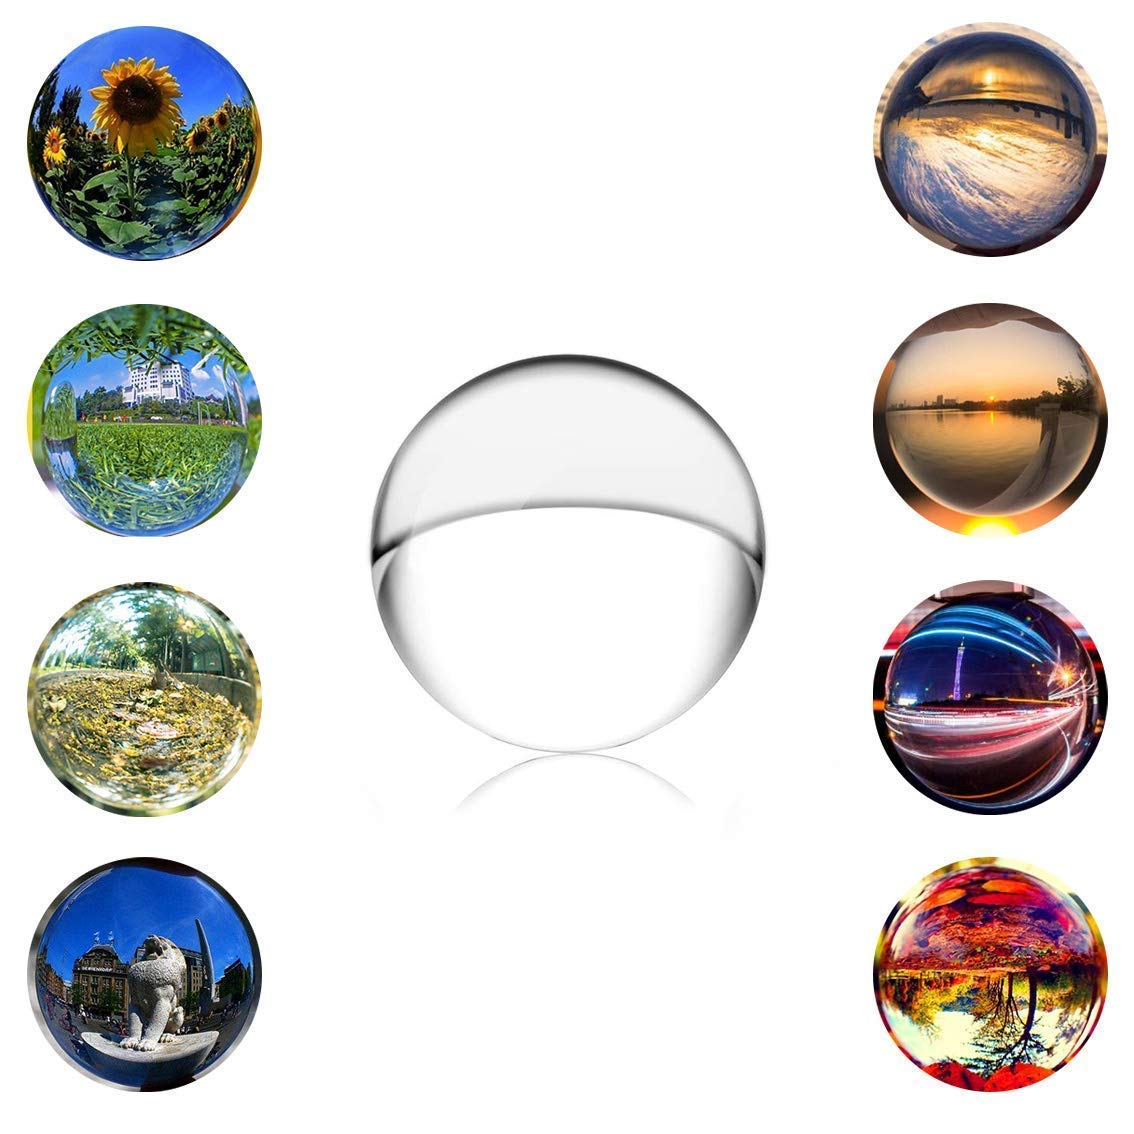 SunAngel 70mm Clear Crystal Ball - Meditation Sphere Ball- Divination & Interpretation Sefirot Crystal Ball - Decor Photography Balll - No Stand